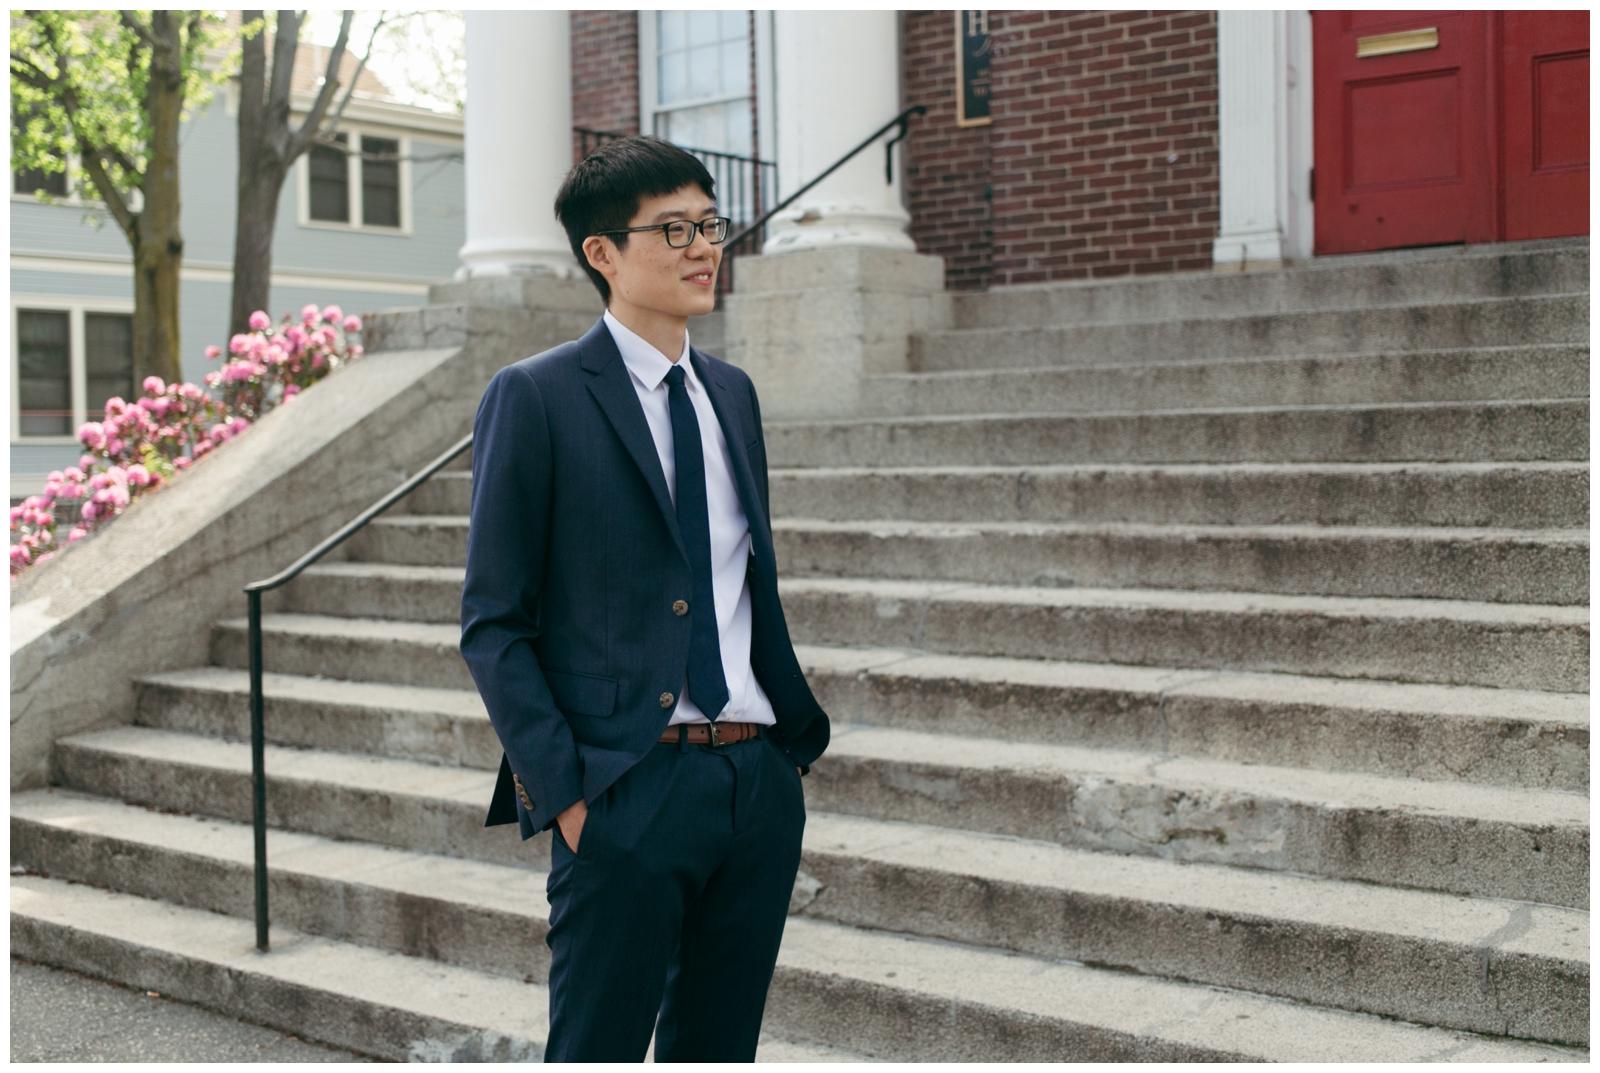 Samberg-Conference-Center-Boston-Wedding-Photographer-Bailey-Q-Photo-026.jpg